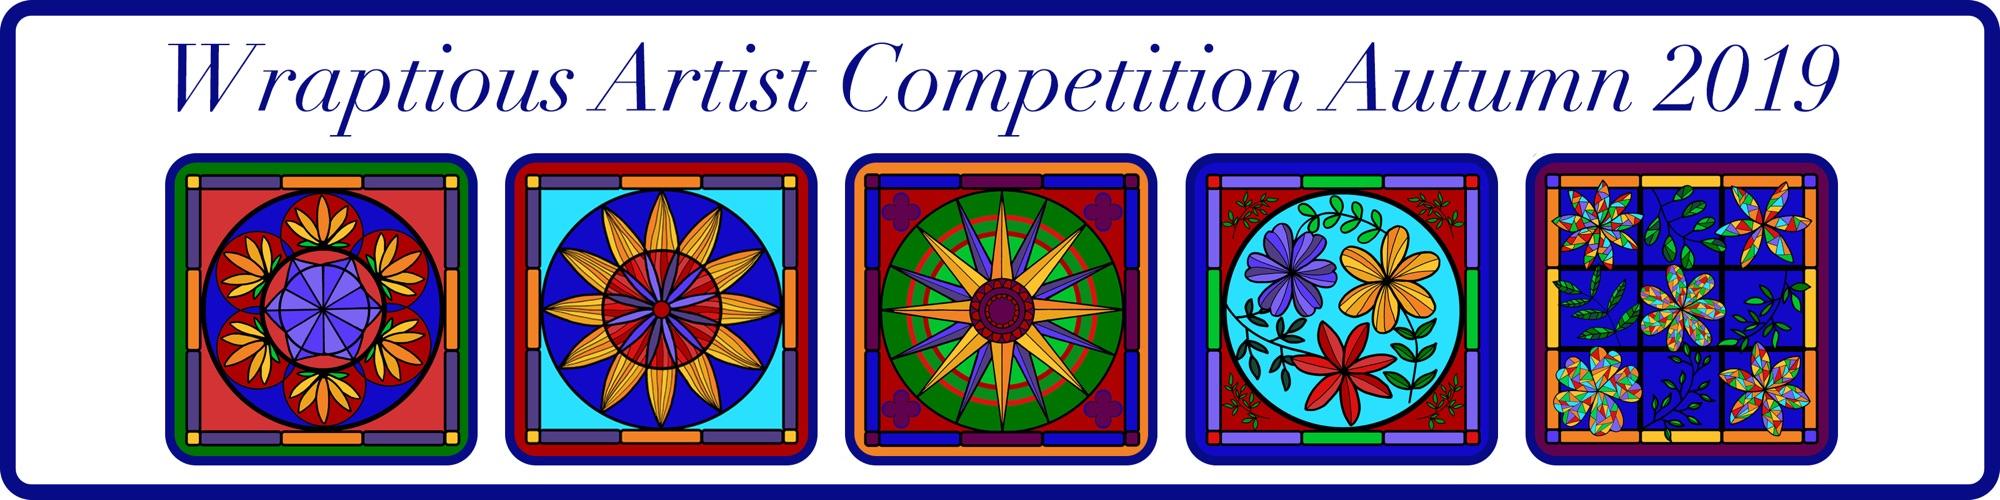 Wraptious-Autumn-competition-blog-title